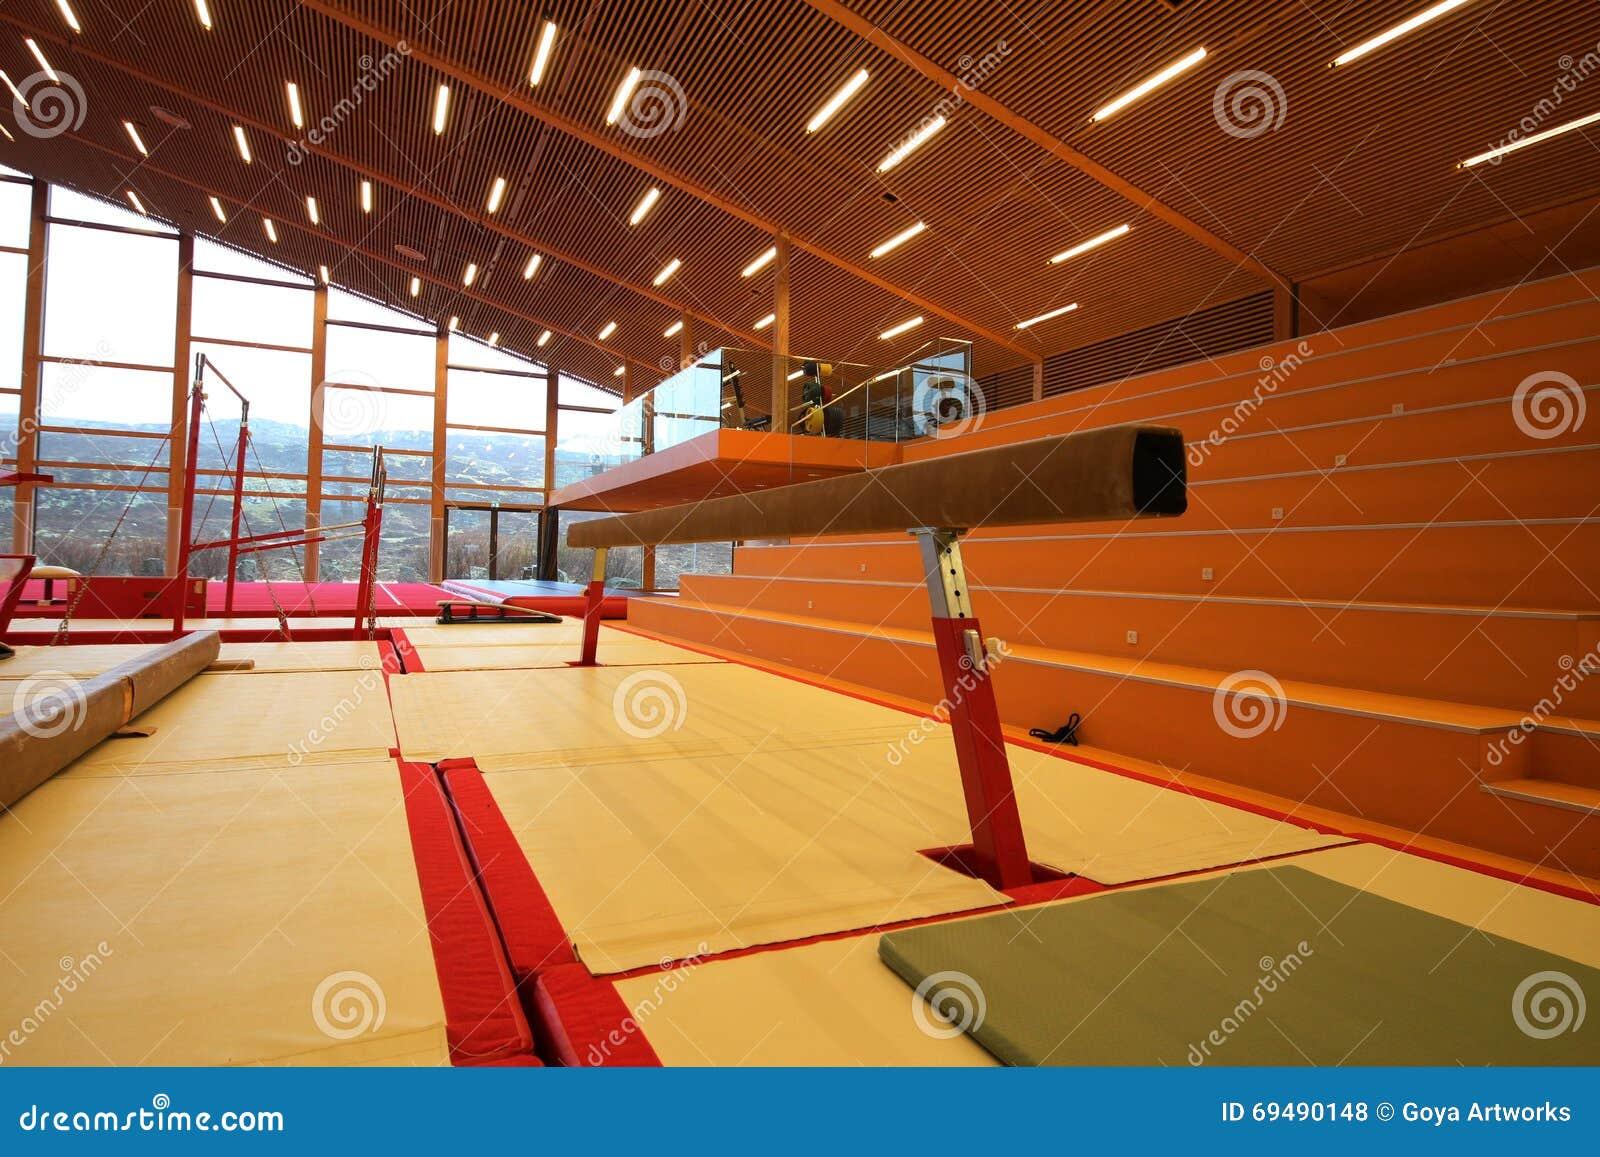 Gymnastic Equipment Stock Photo Image Of Beam Strength